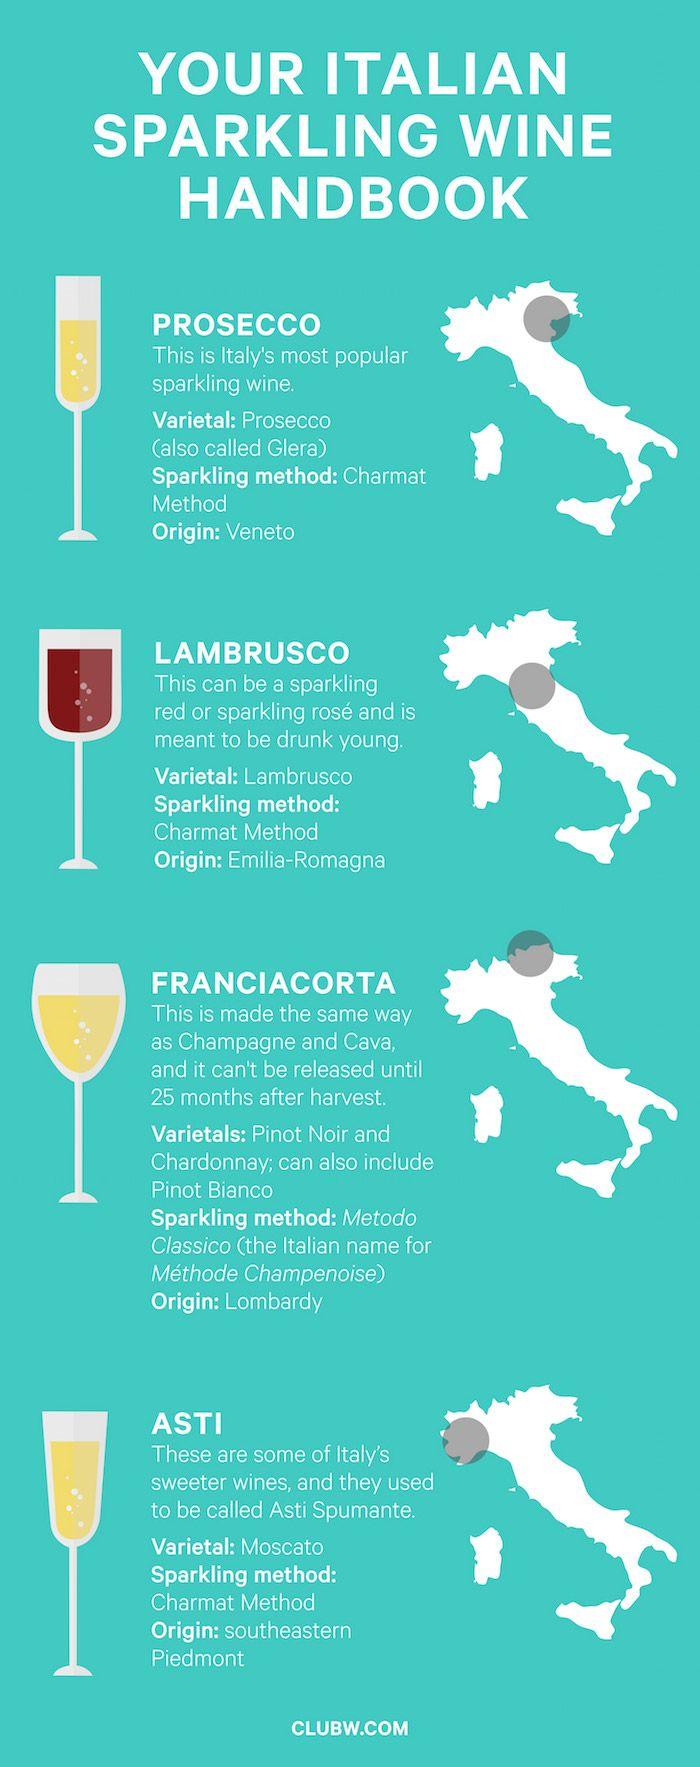 Frizzante? Spumante? // Your Italian Sparkling Wine Handbook - The Juice | Club W